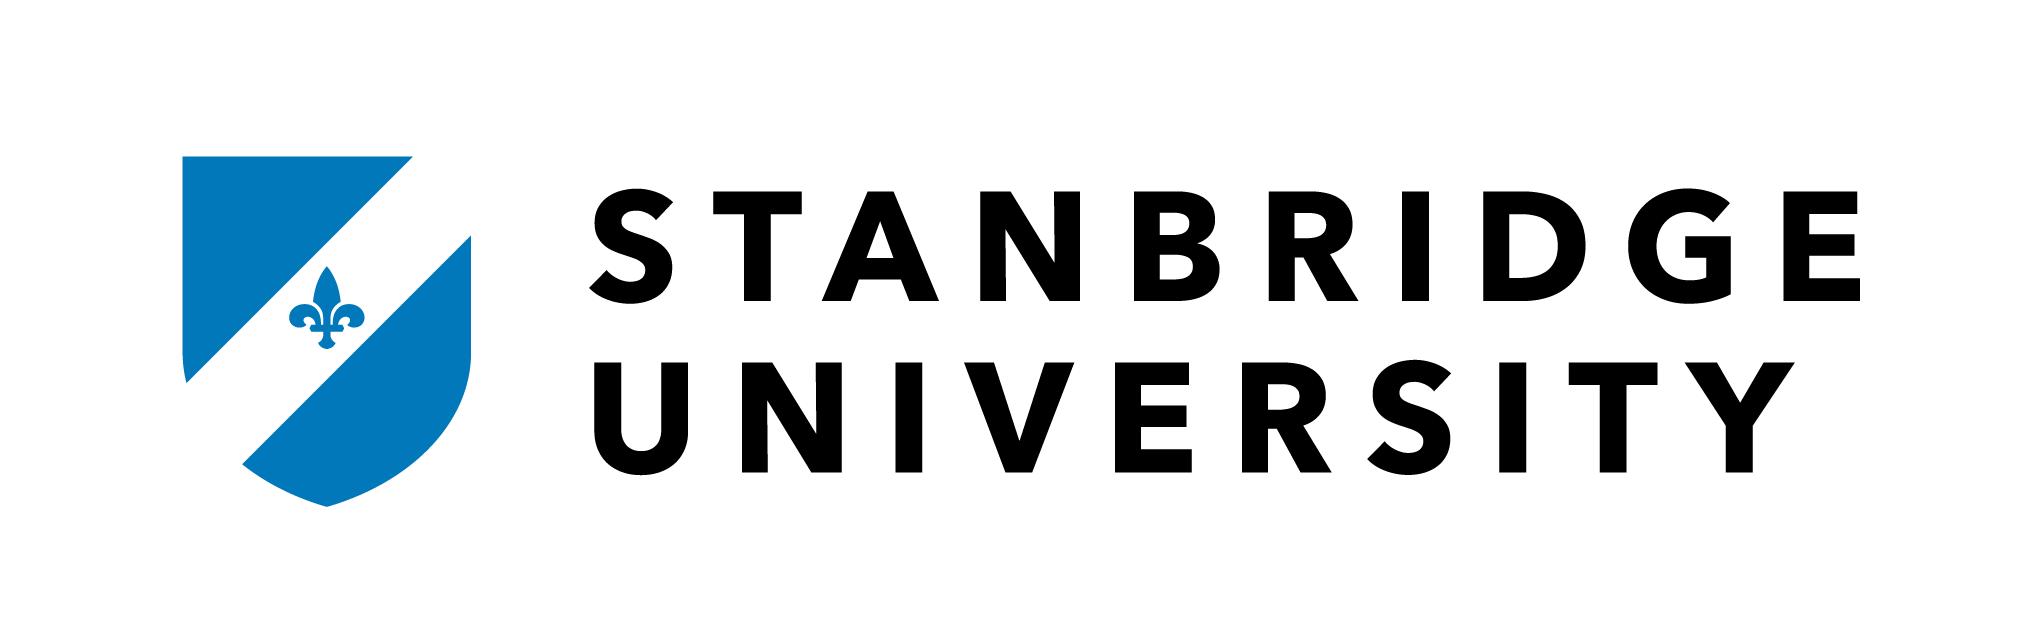 Stanbridge-University-Logo-Wide-02